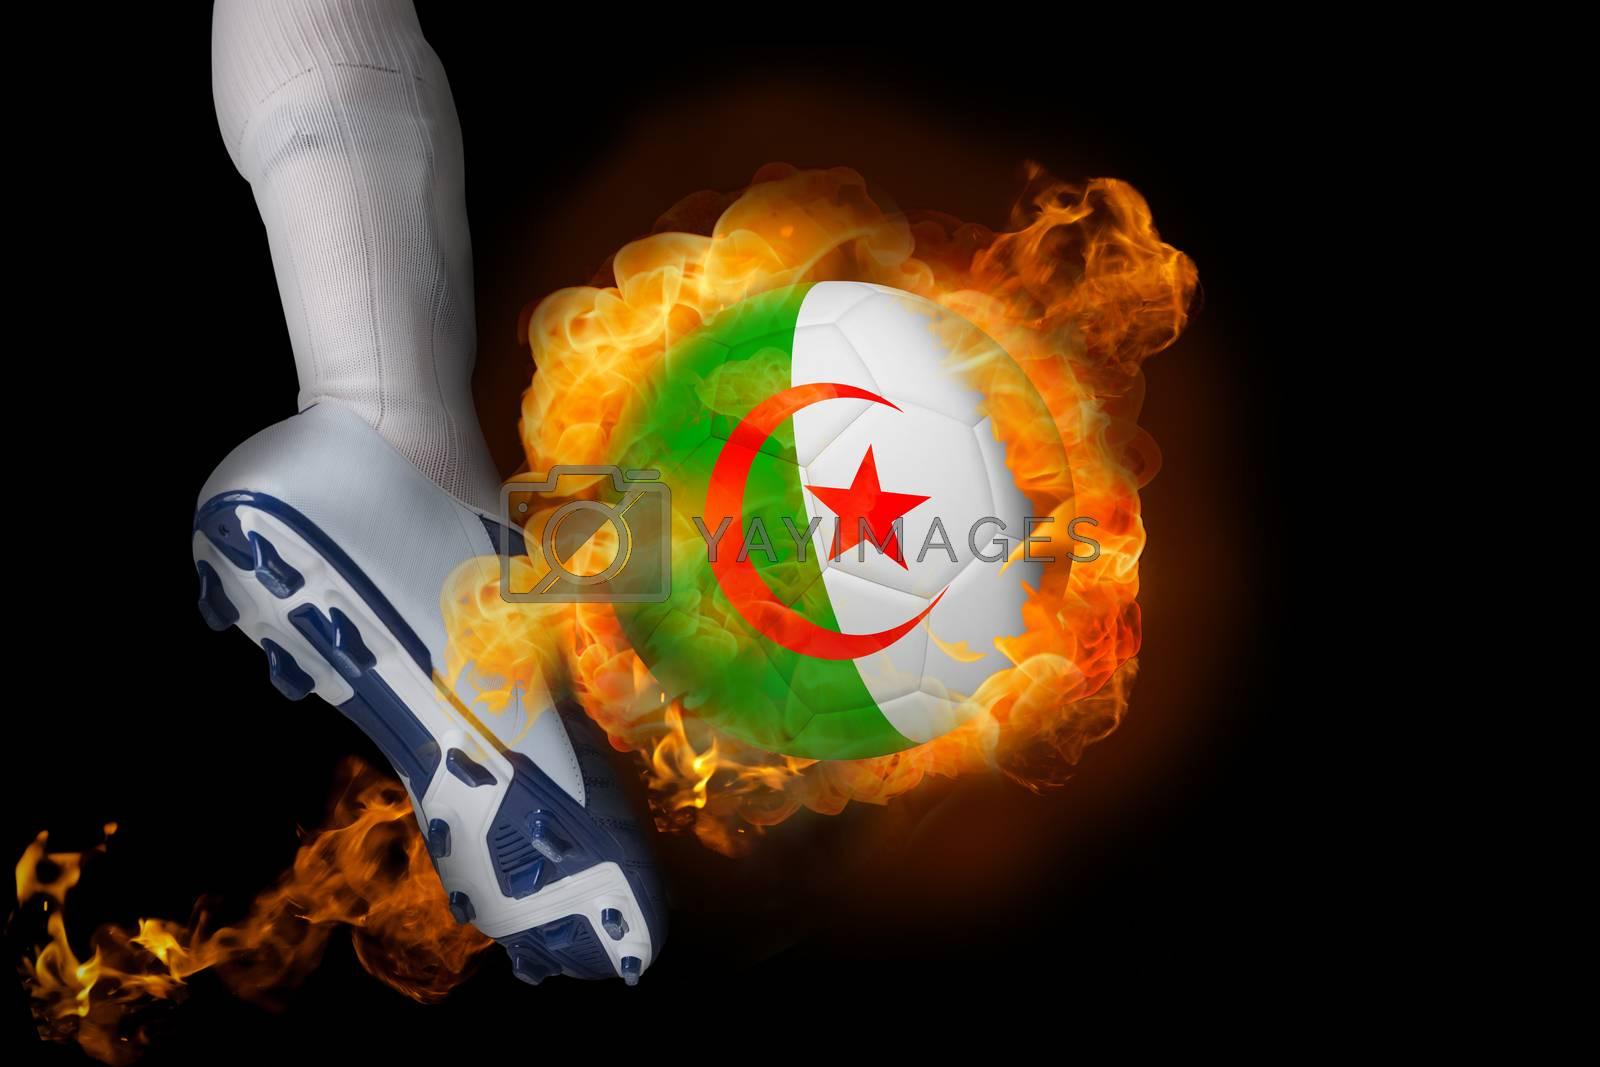 Football player kicking flaming algeria ball by Wavebreakmedia